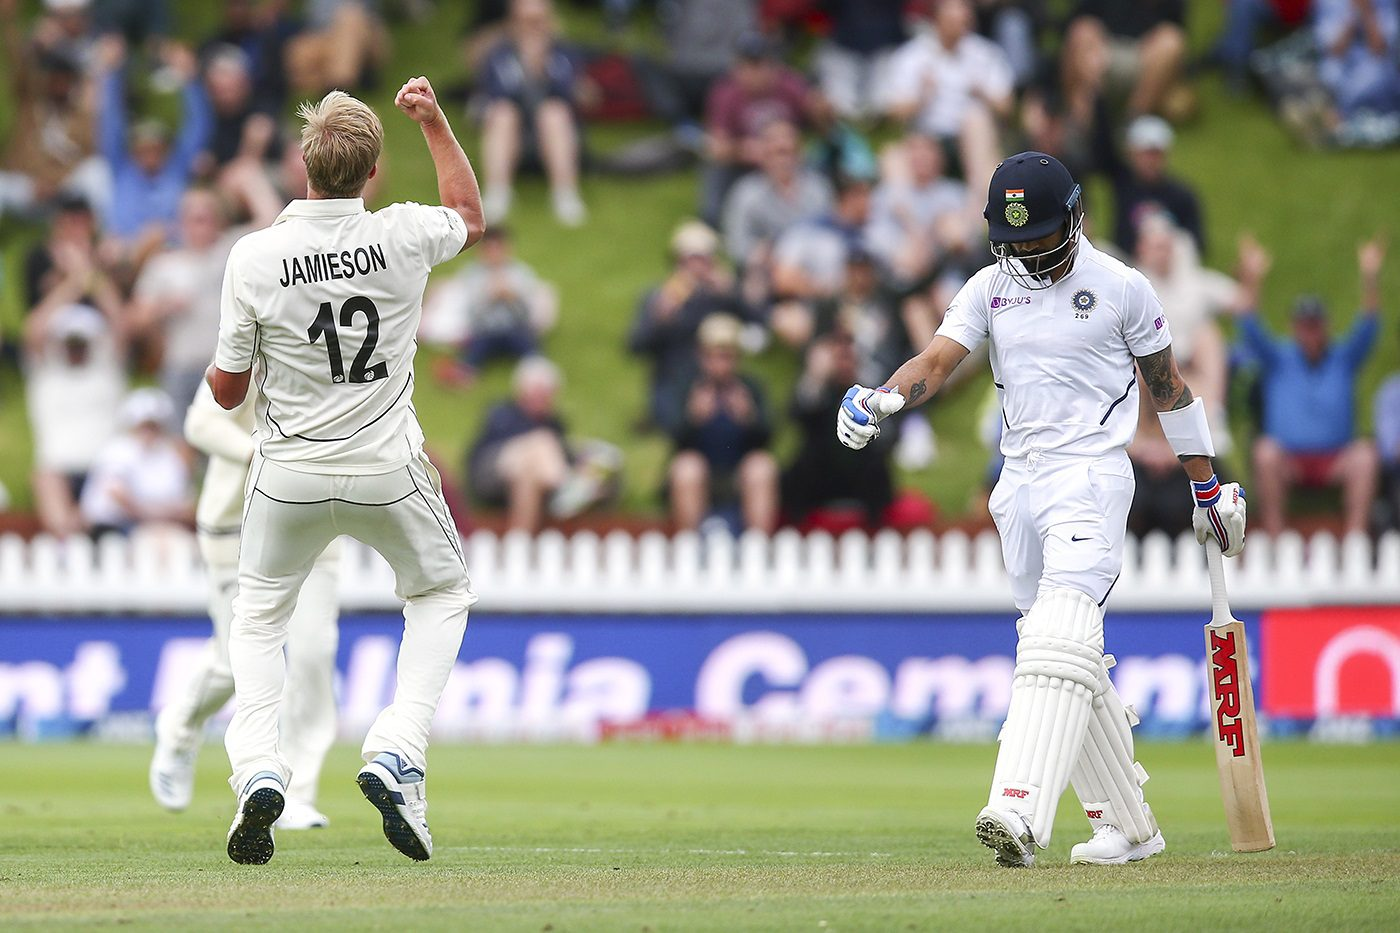 India vs New Zealand: IND vs NZ WTC Match Predictions and Dream11 Team